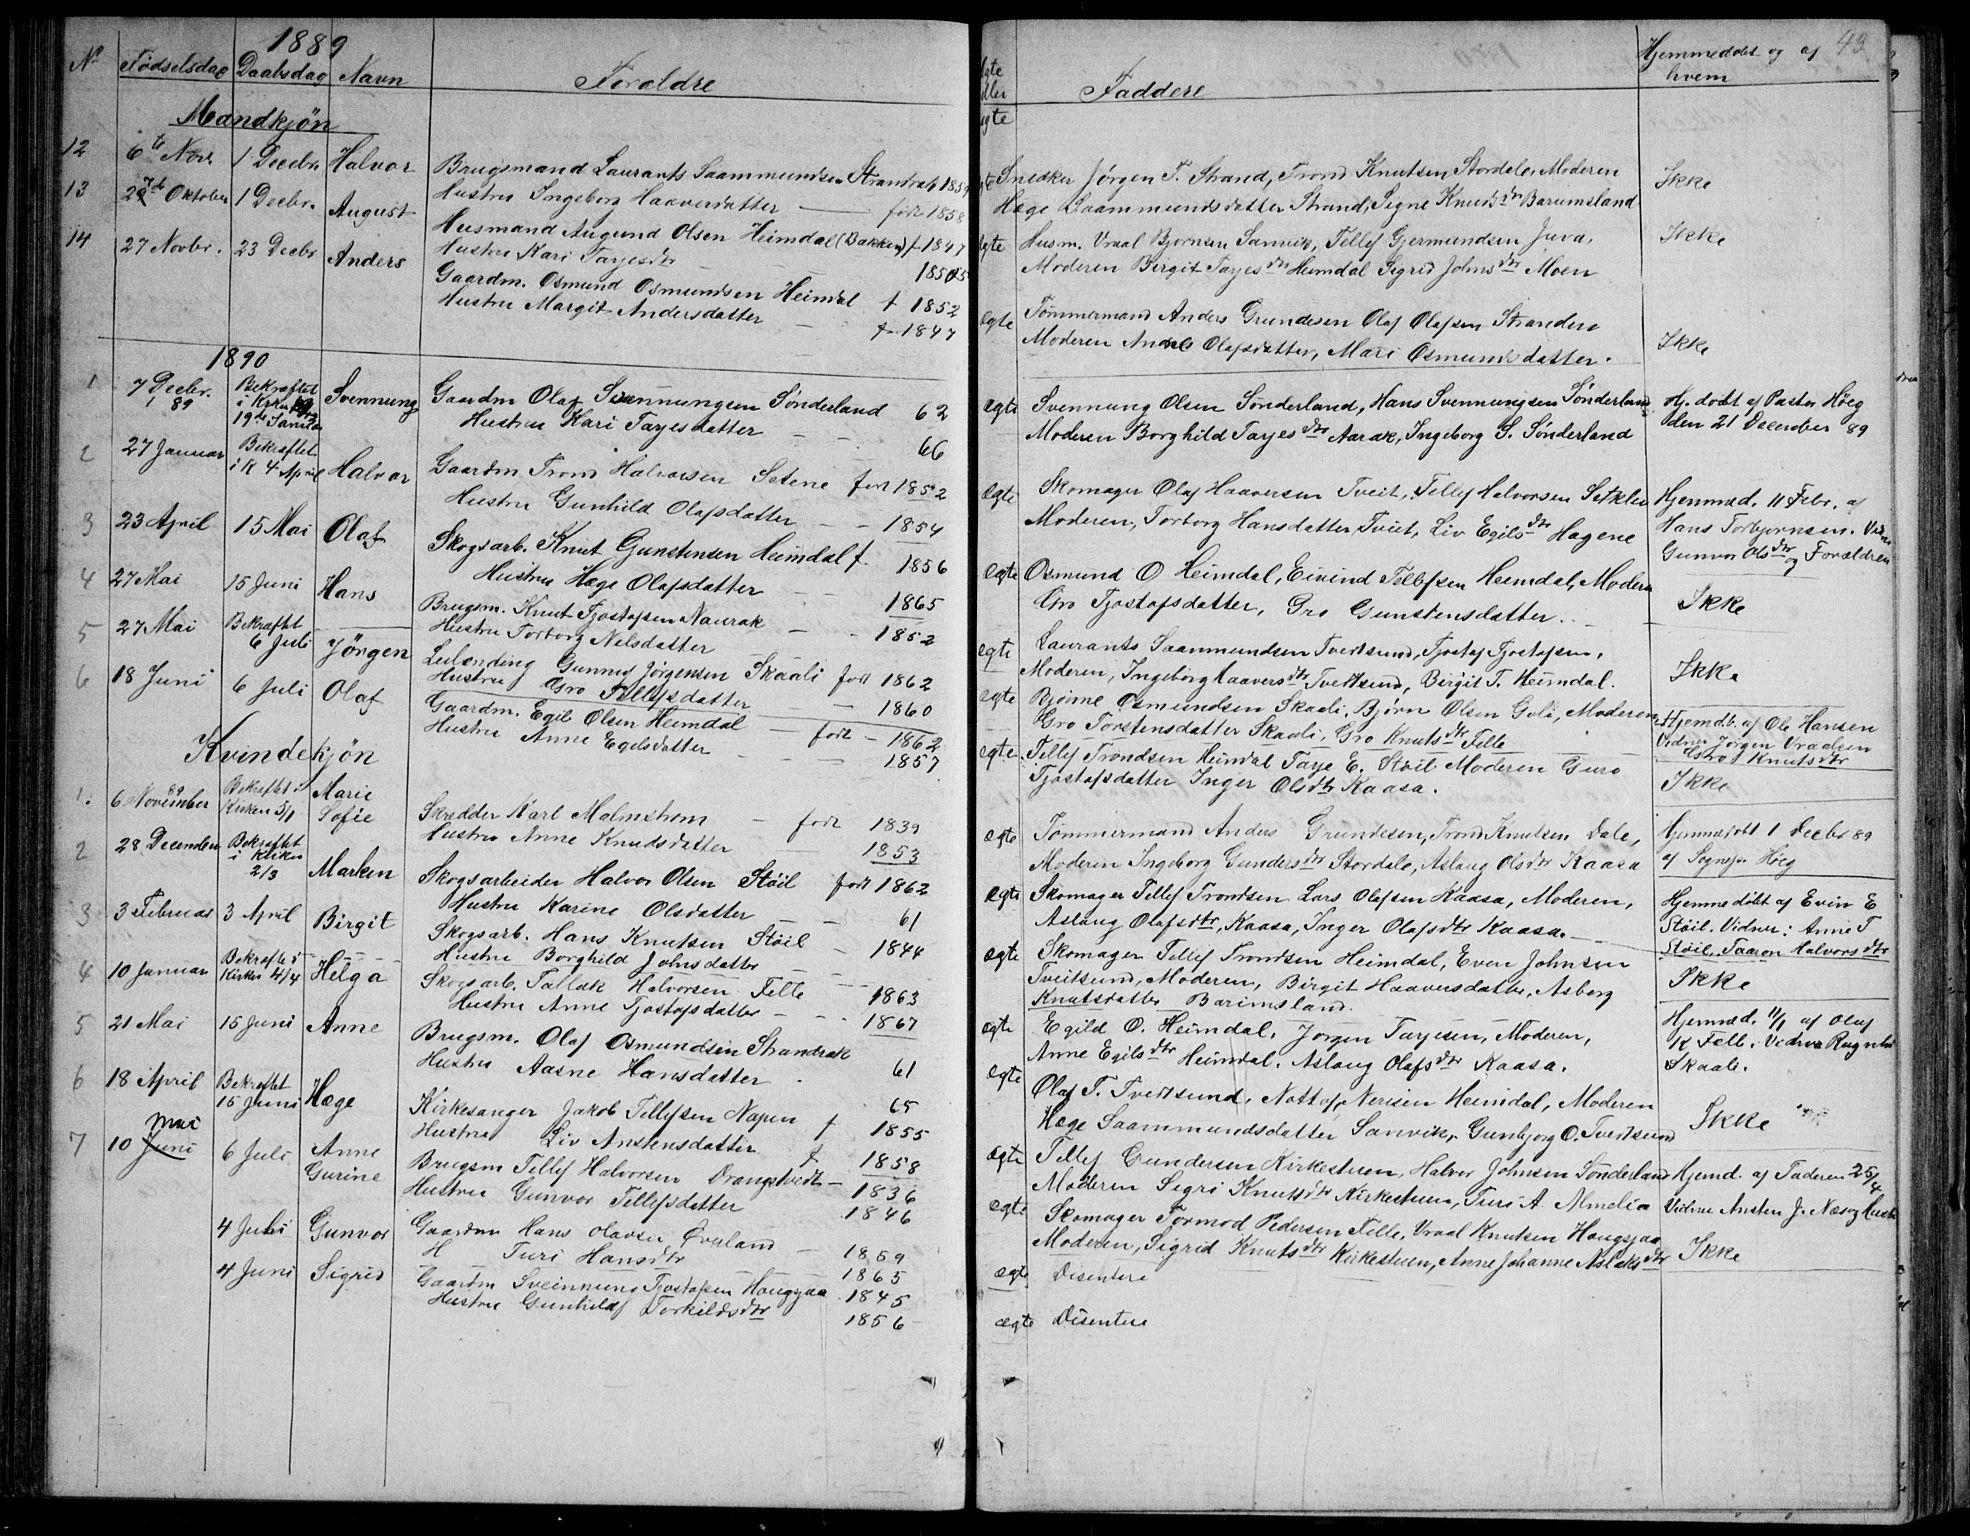 SAKO, Nissedal kirkebøker, G/Gb/L0002: Klokkerbok nr. II 2, 1863-1892, s. 43